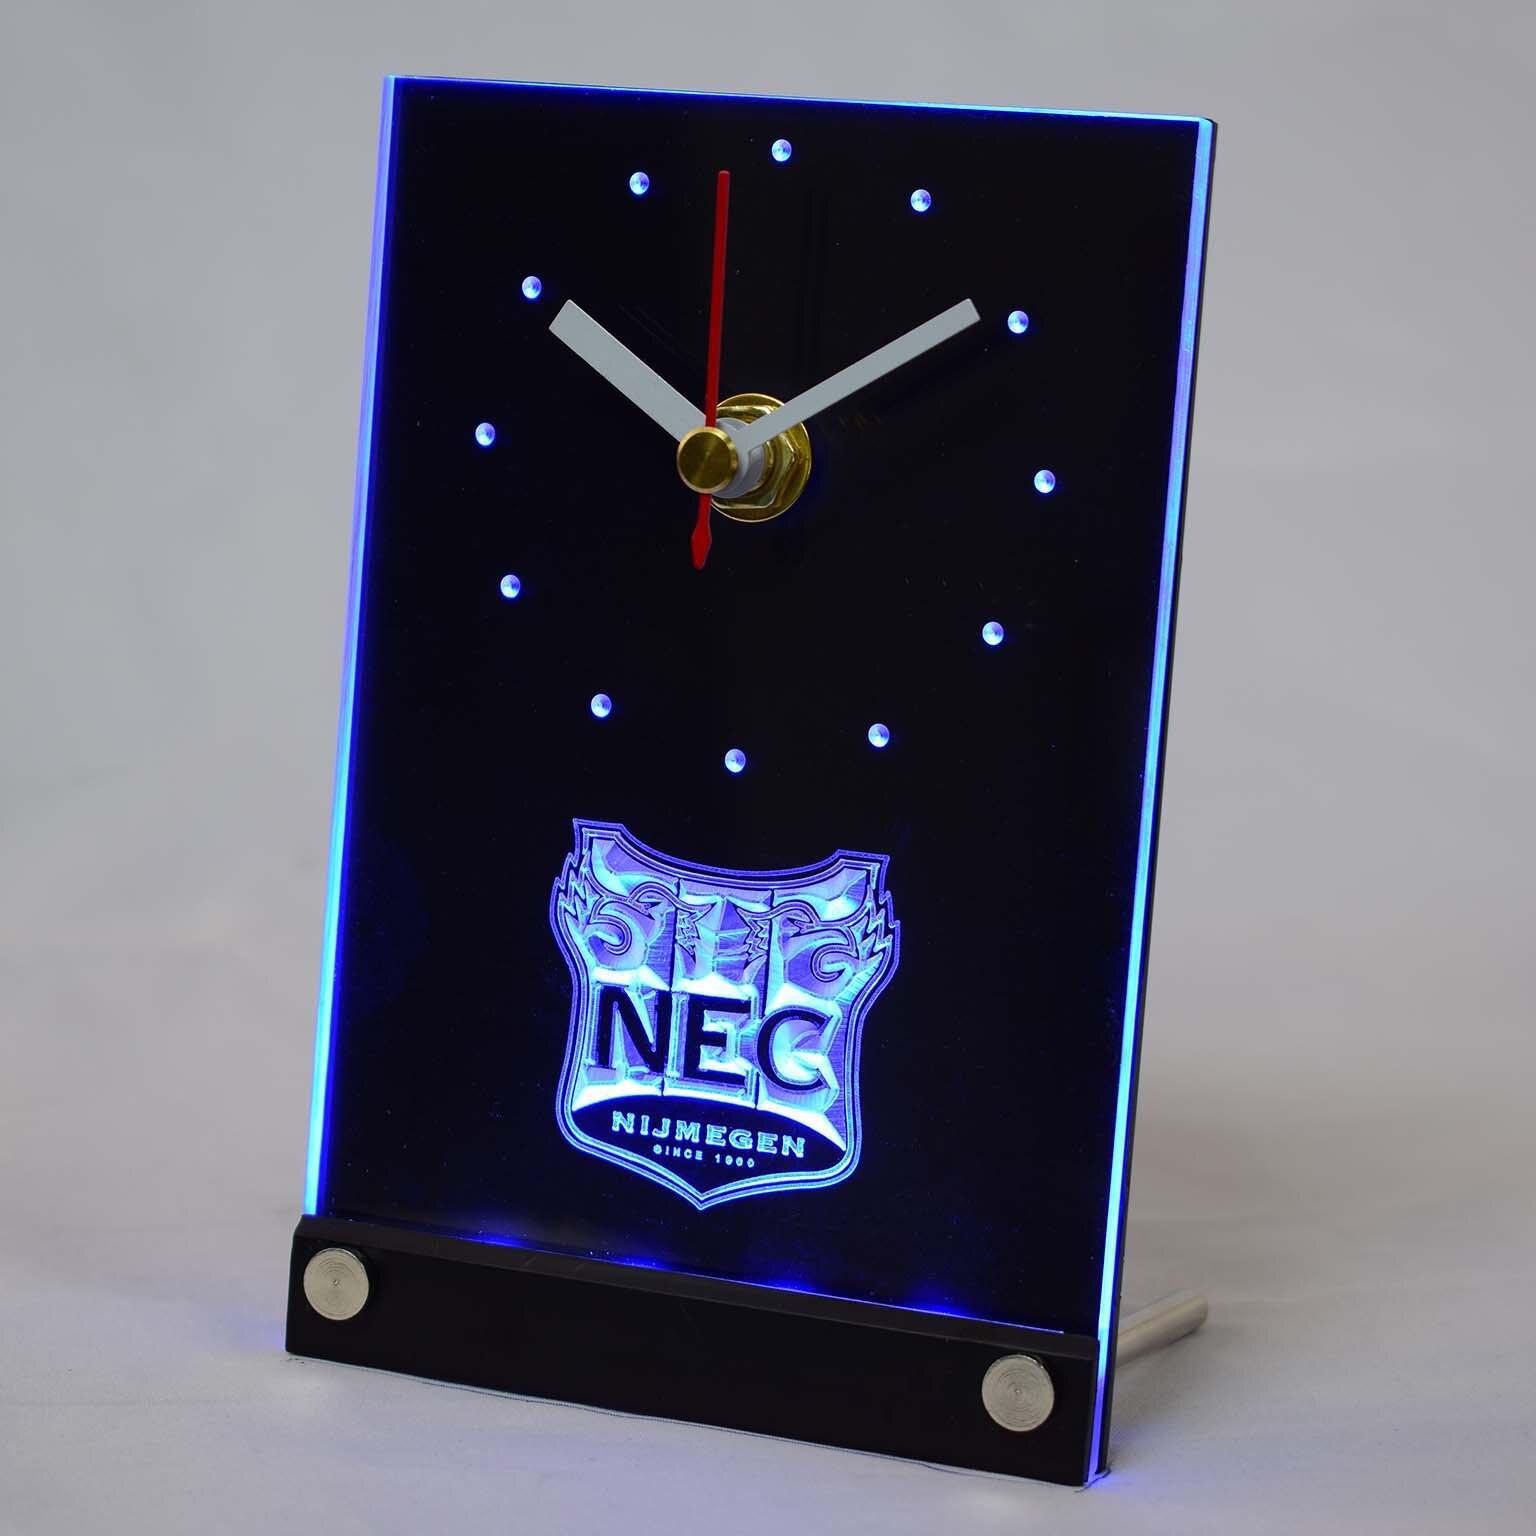 Tnc1020 NEC Nijmegen Eredivisie, Fútbol 3D LED reloj de mesa escritorio